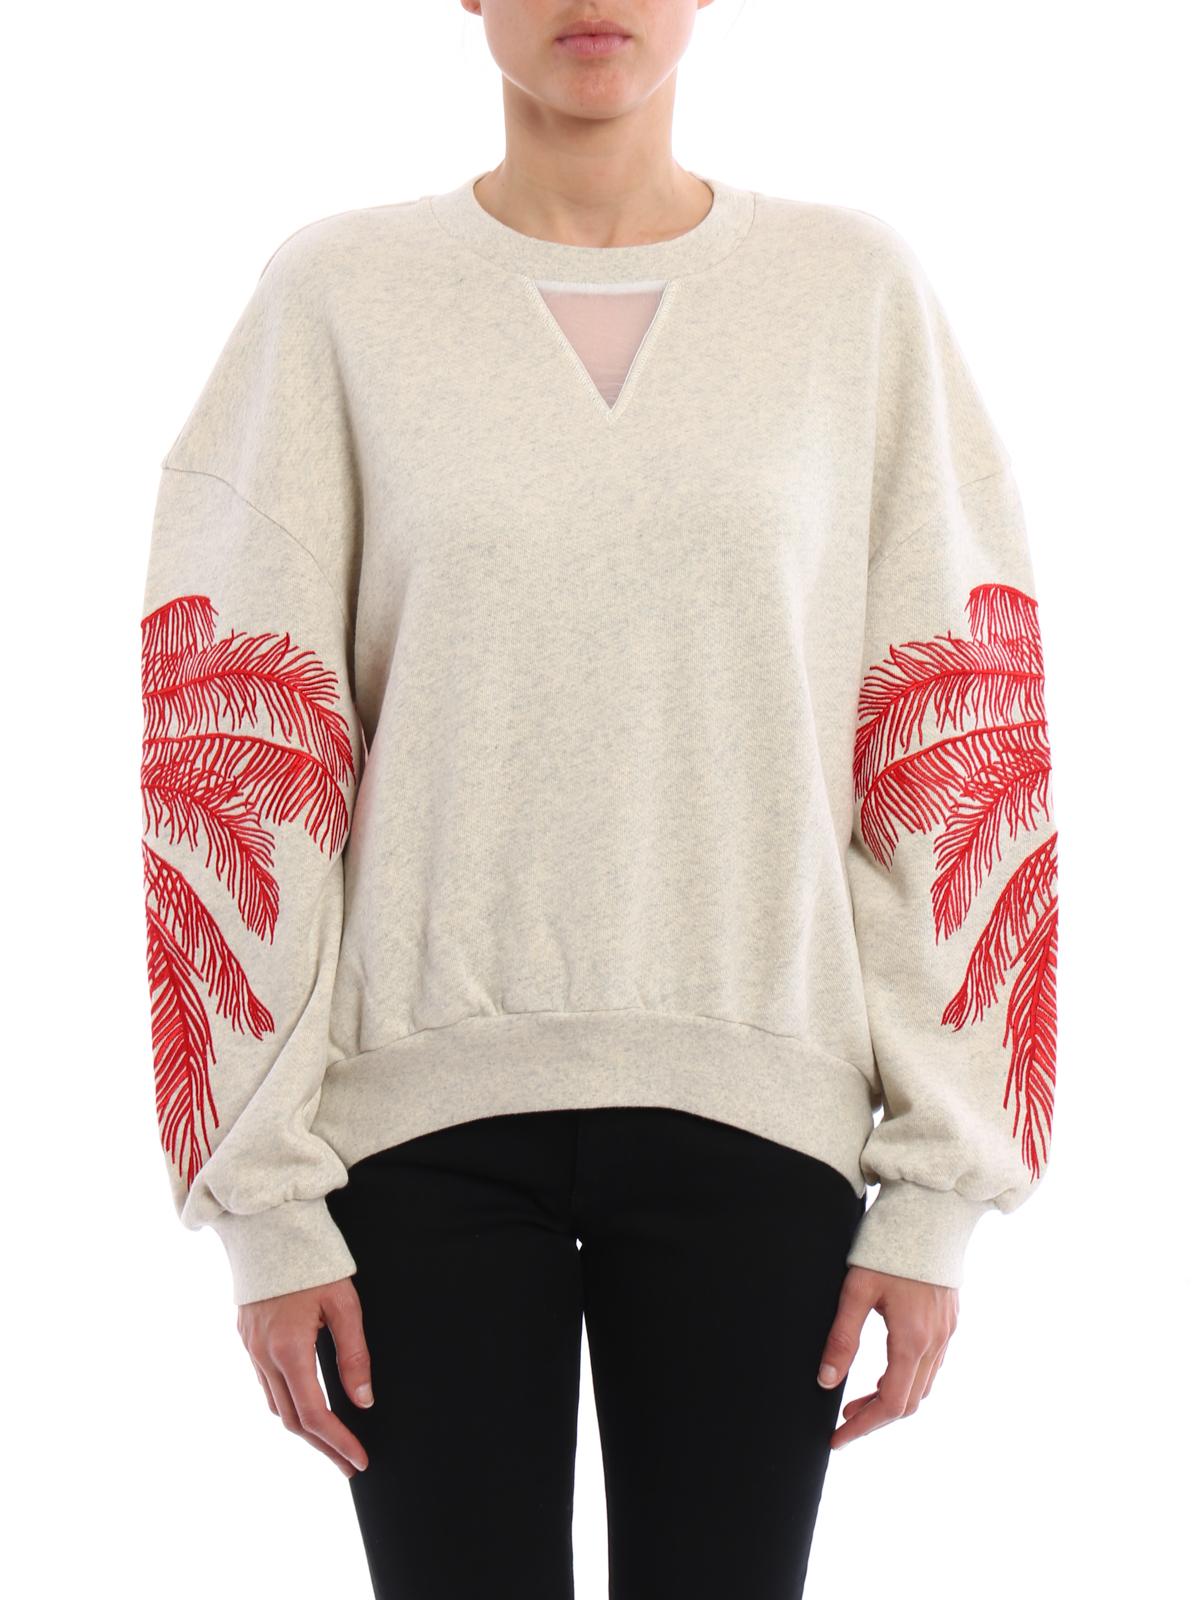 Embroidered cotton sweatshirt by Stella Mccartney - Sweatshirts ...